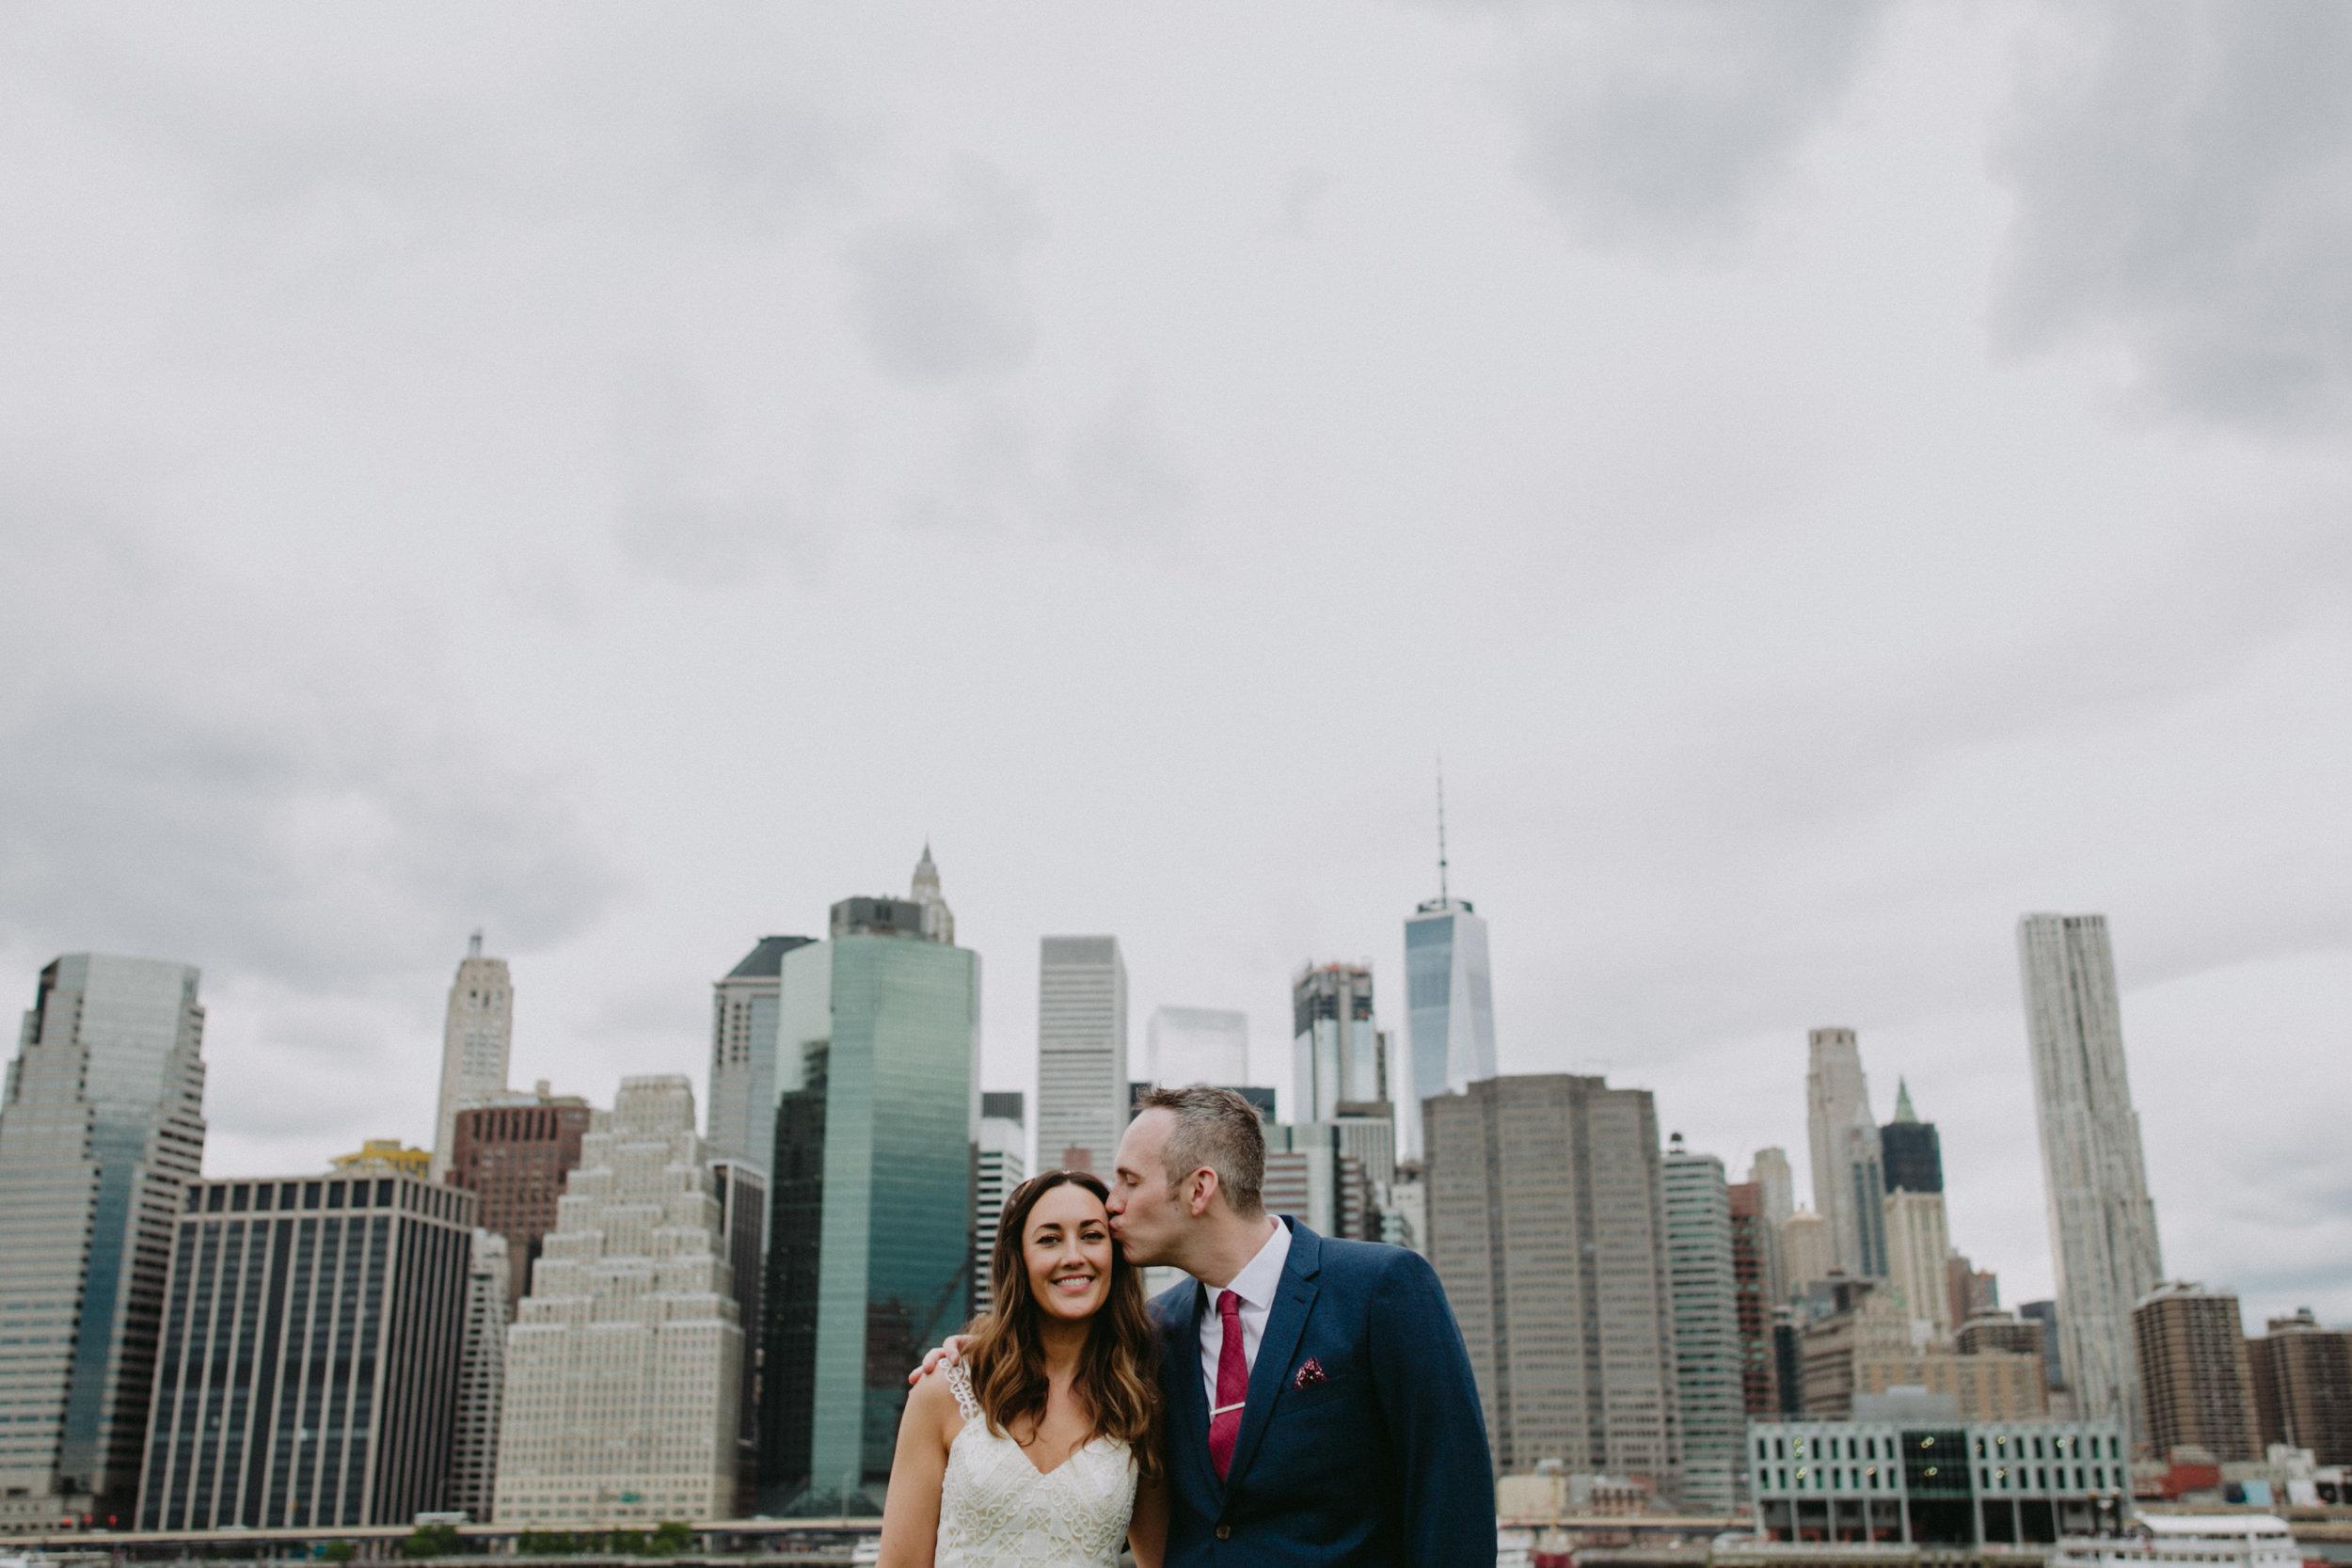 501Union_Brooklyn_Wedding_Photographer_Chellise_Michael_Photography-140.jpg